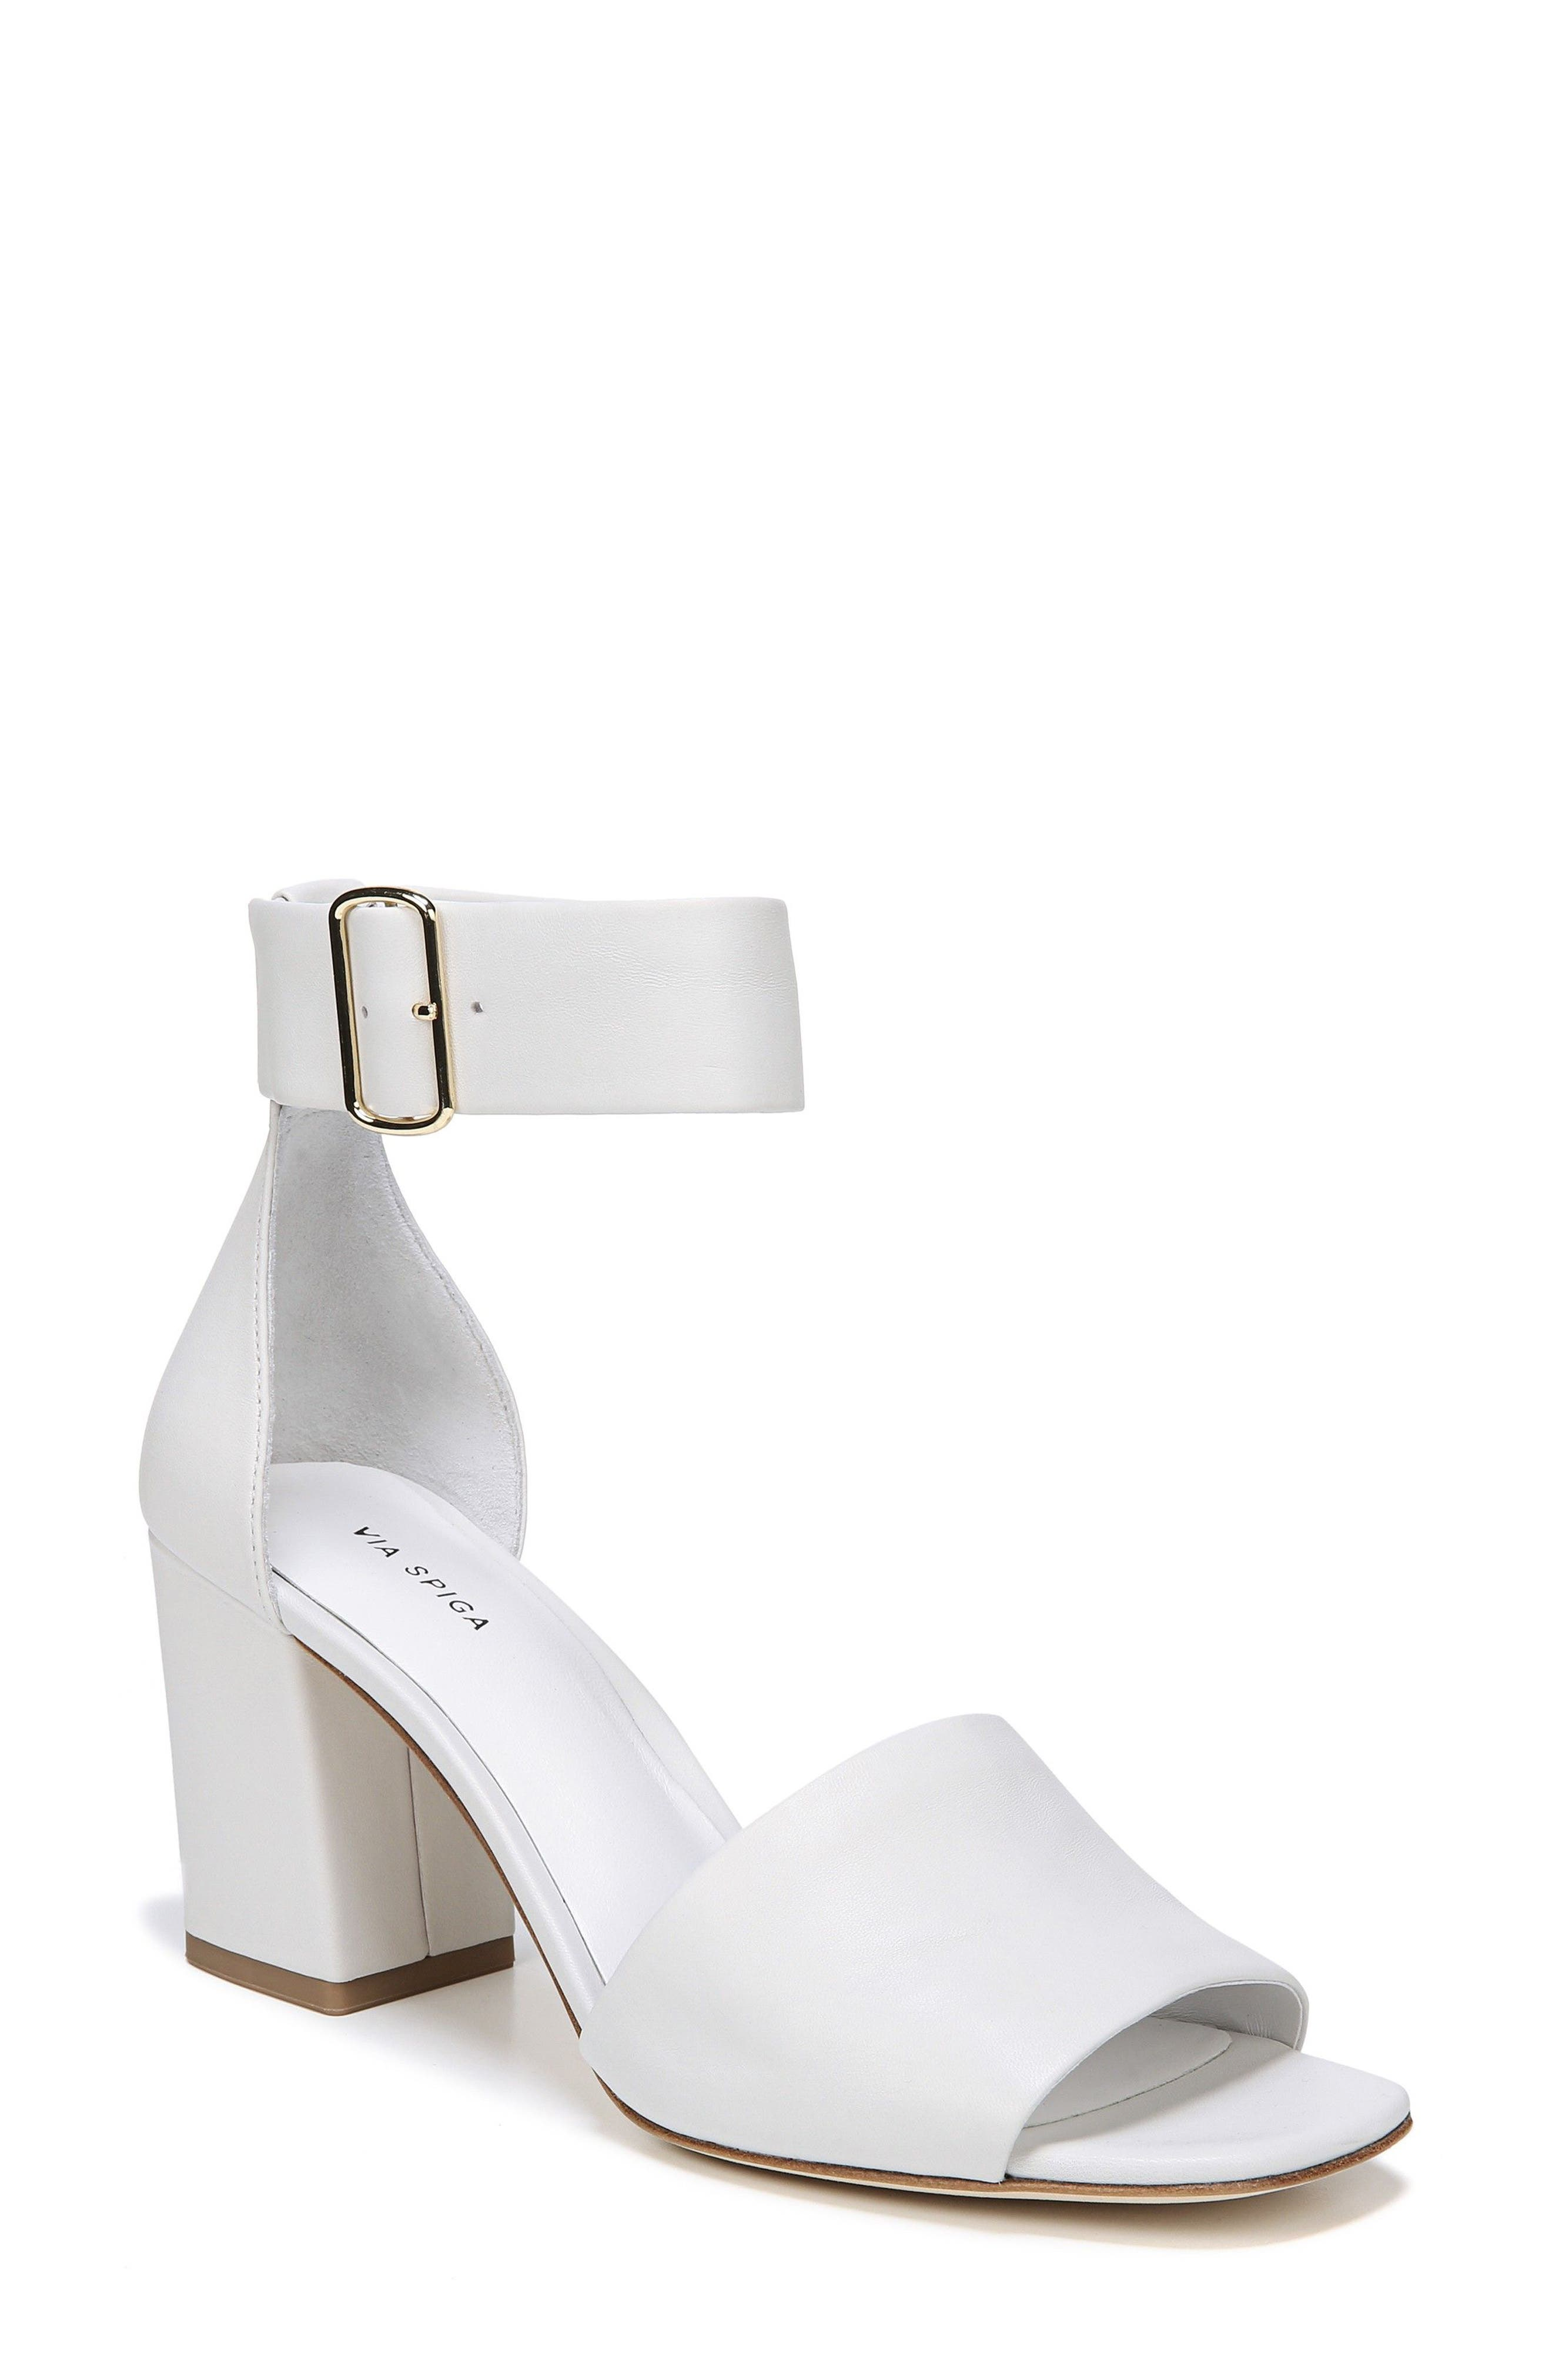 Evonne Ankle Strap Sandal,                             Main thumbnail 1, color,                             100